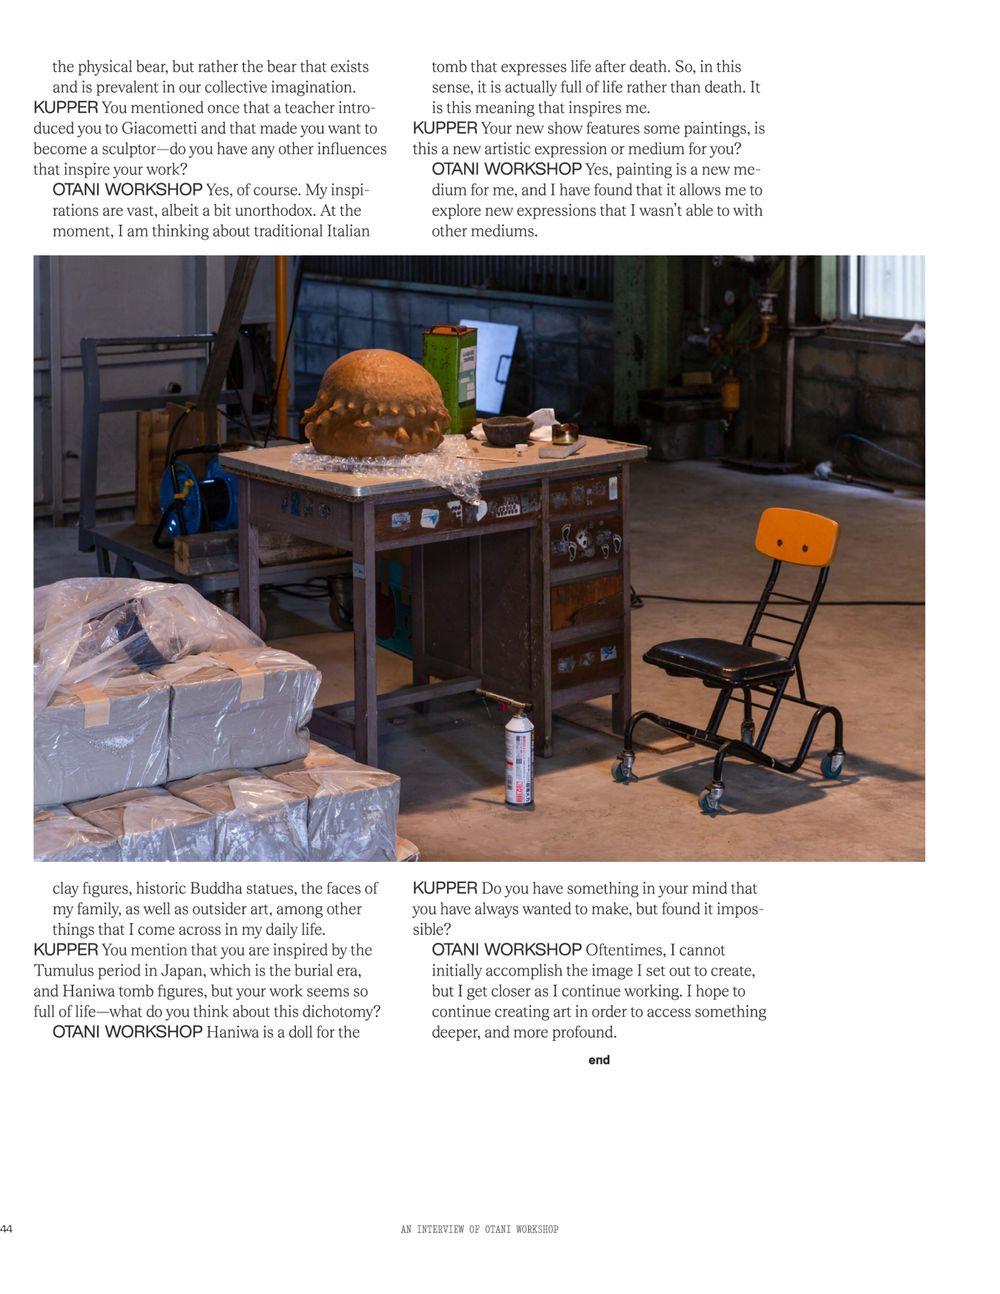 Autre | Otani Workshop